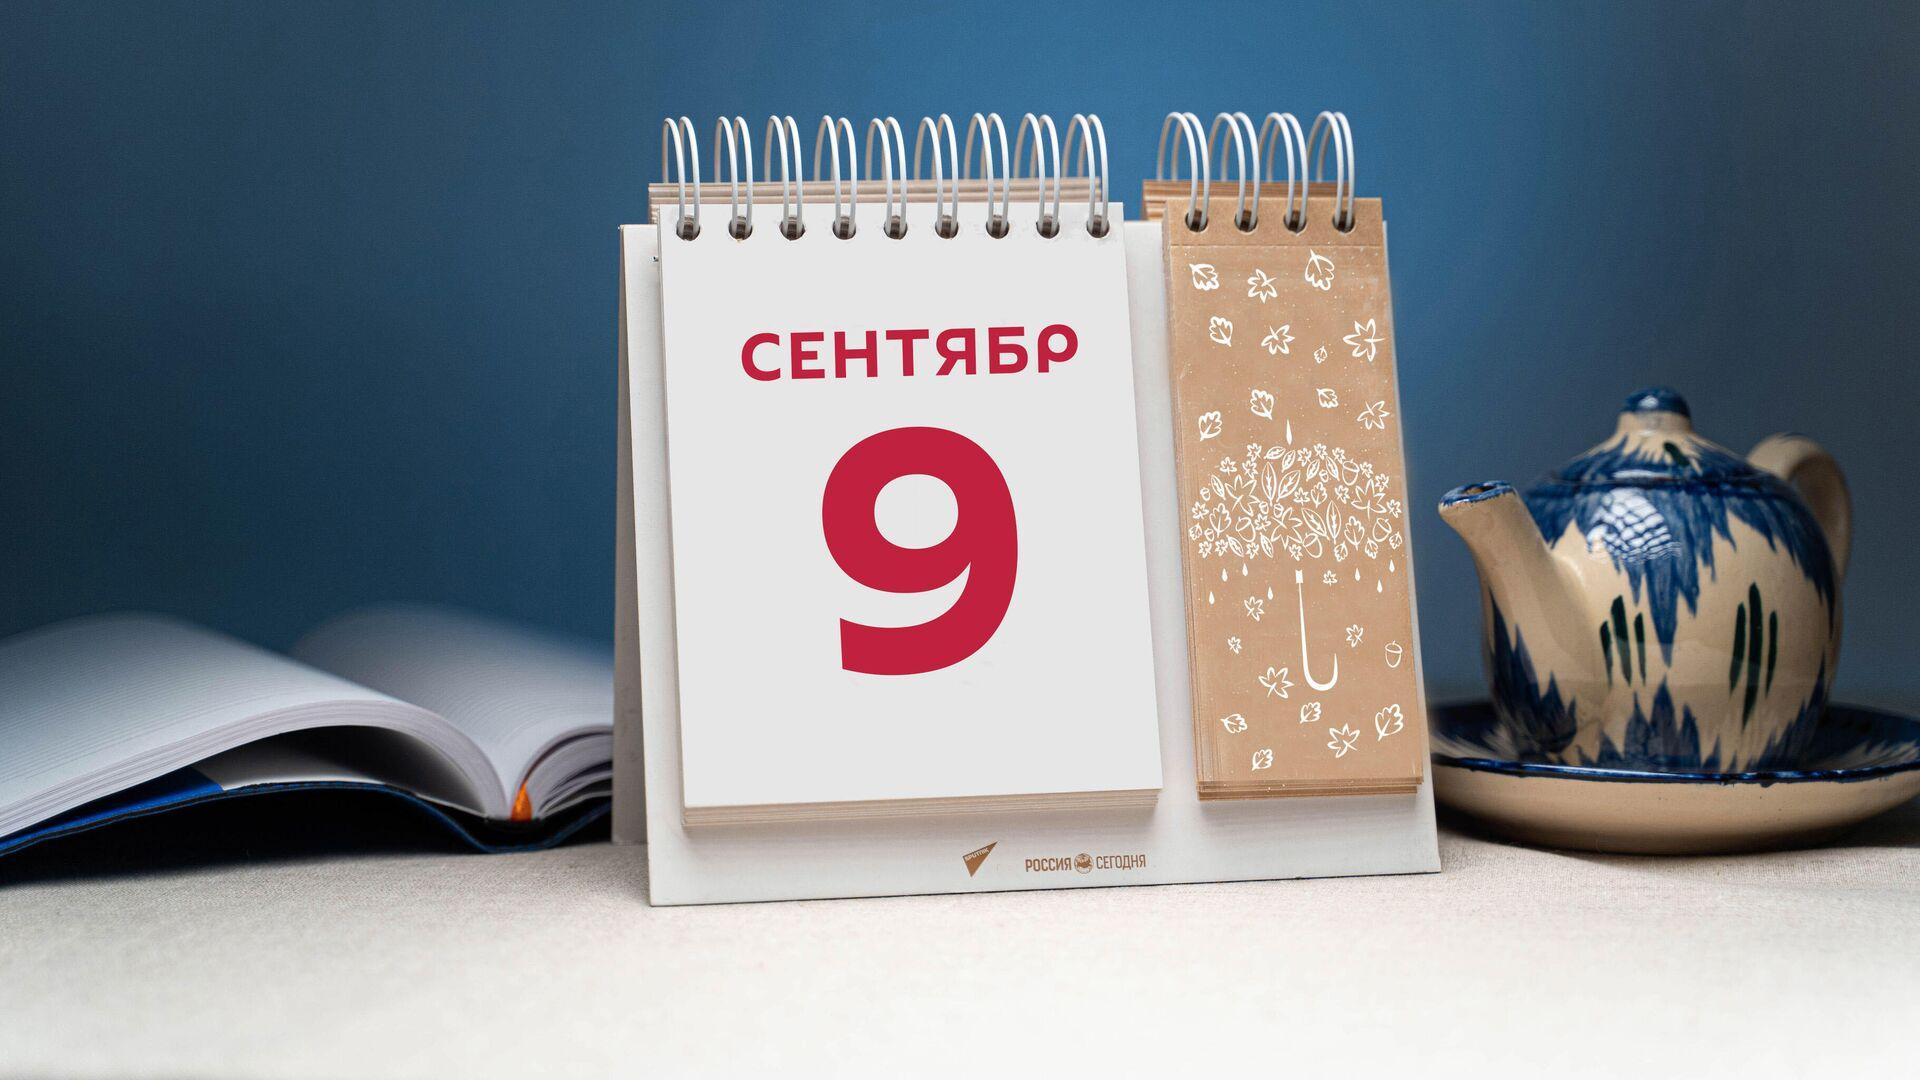 День 9 сентября - Sputnik Тоҷикистон, 1920, 09.09.2021